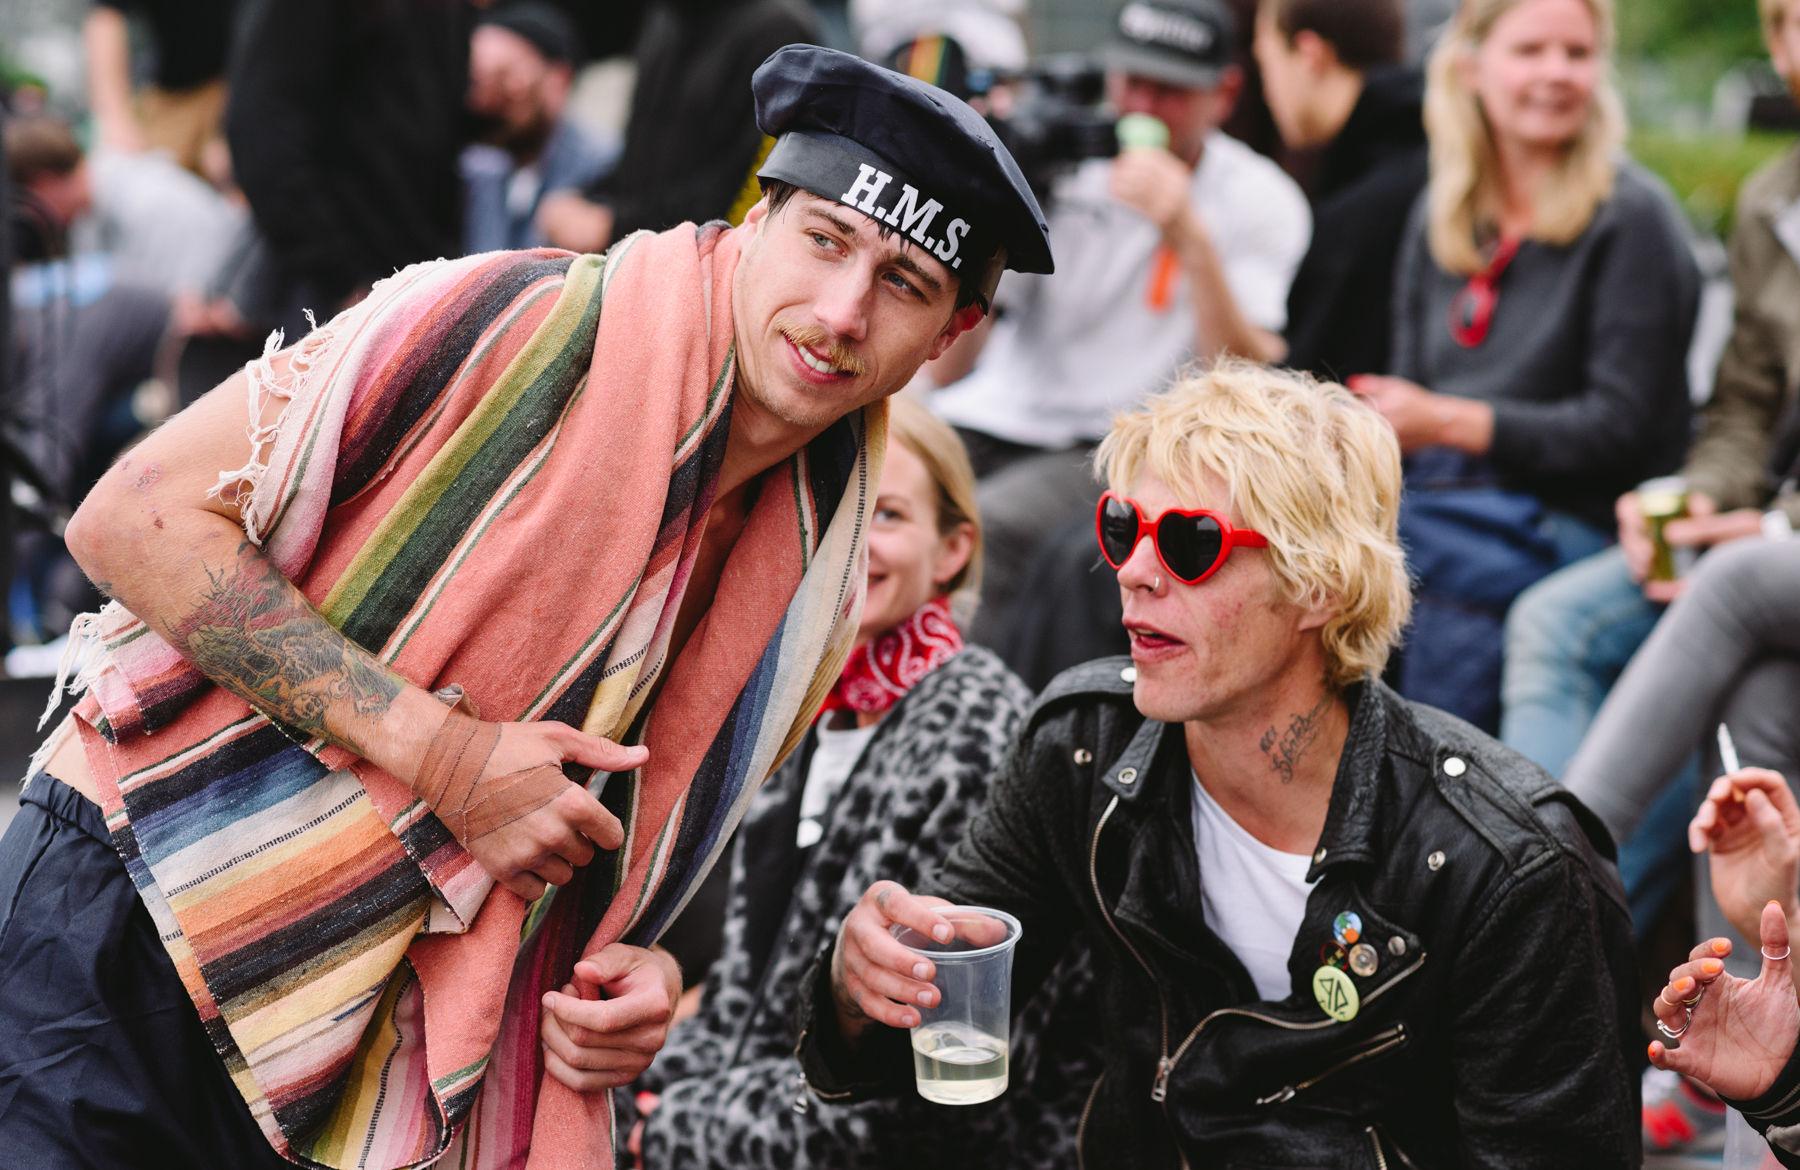 _IHC6486e-David-Gravette-Braydon-Szafranski-Nike-SB-Copenhagen-Open-Day-5-July-2015-Photographer-Maksim-Kalanep